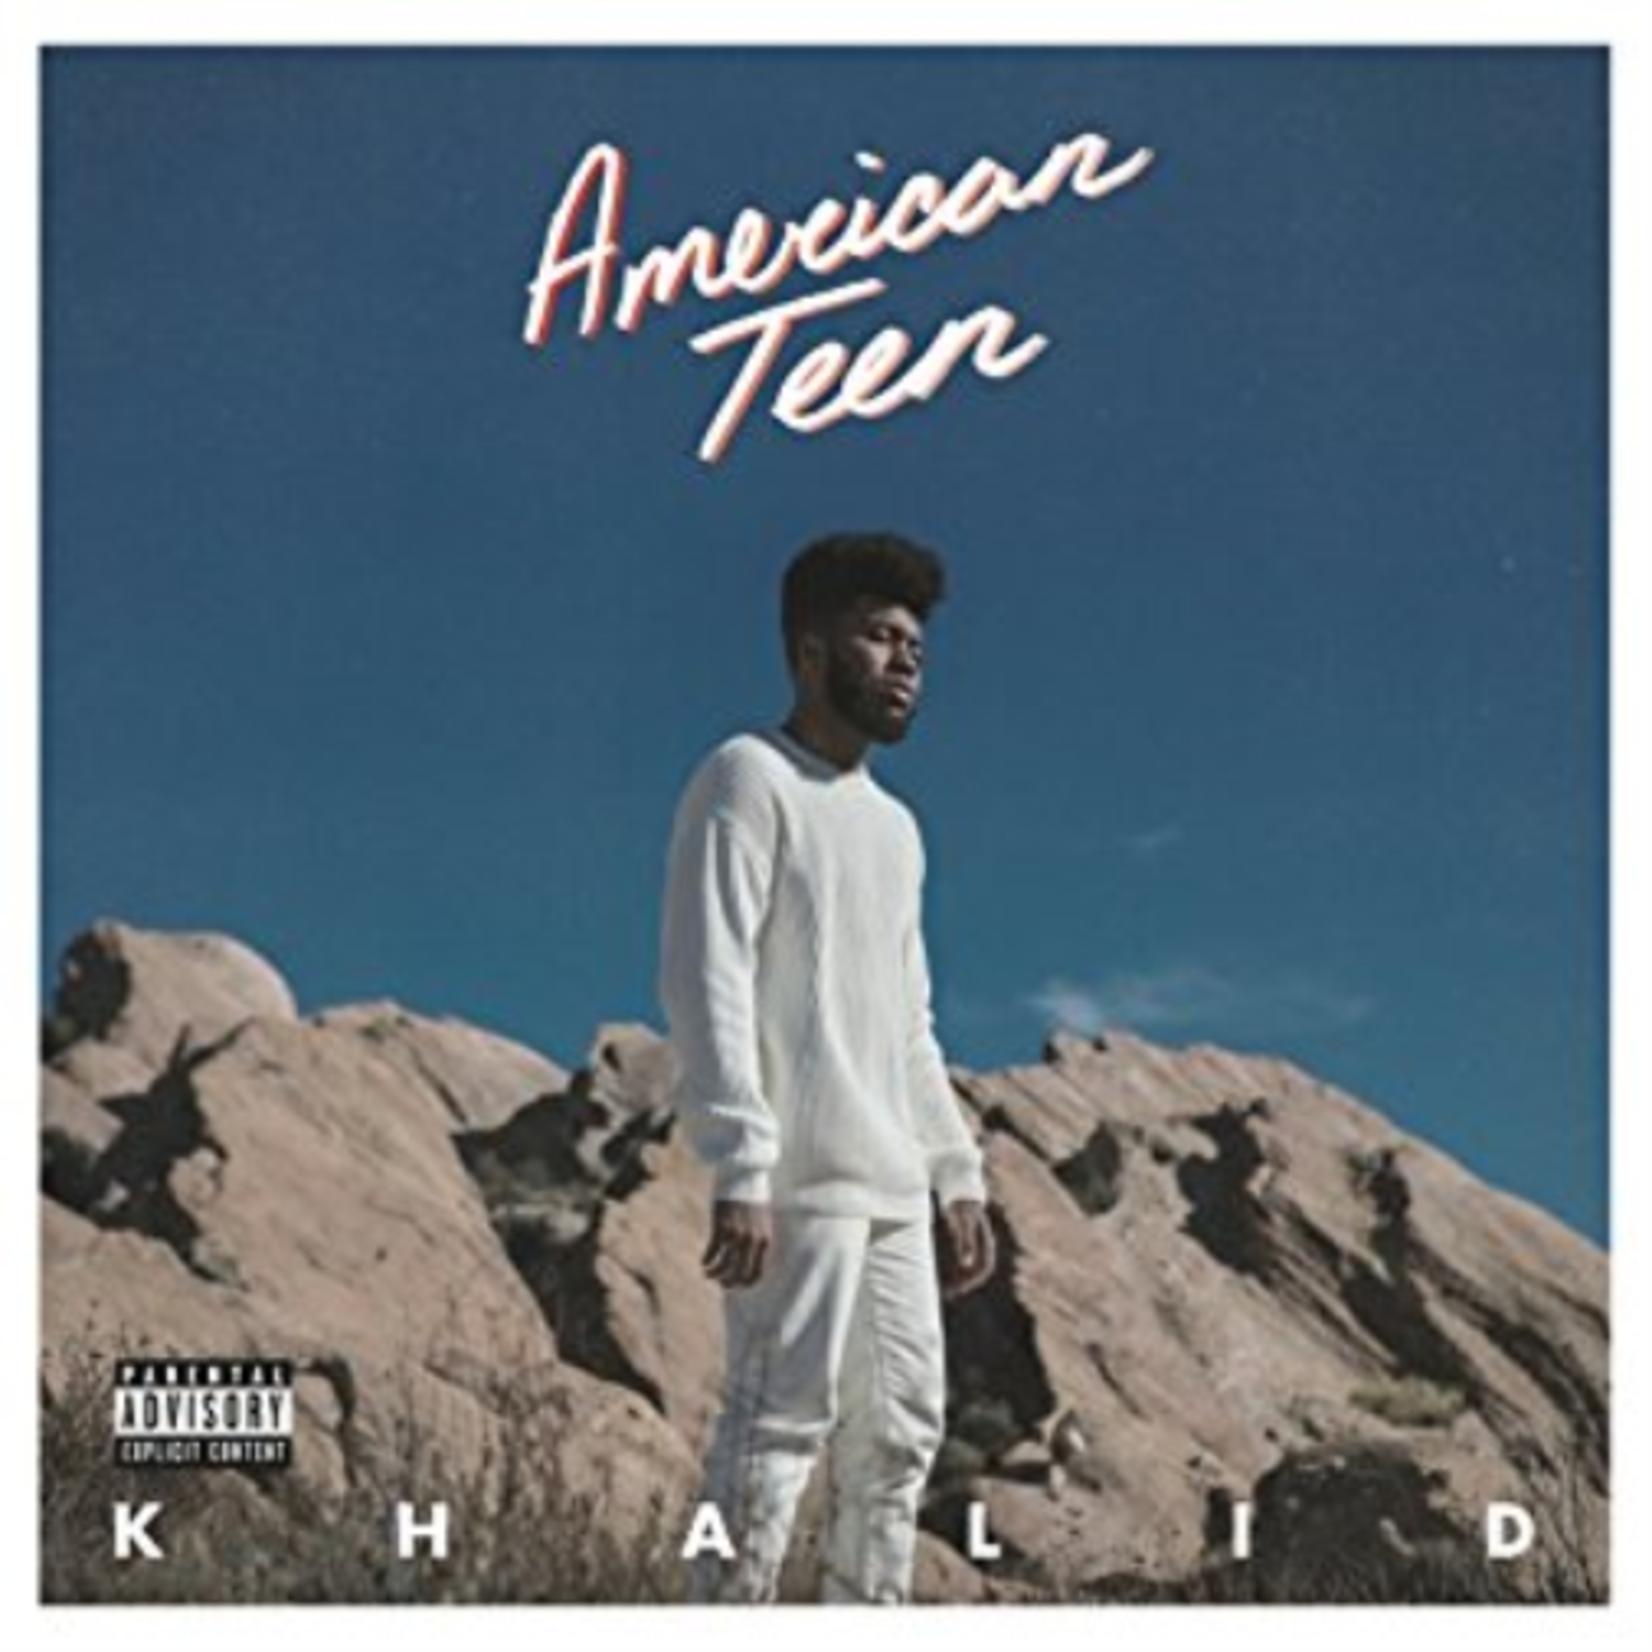 KHALID AMERICAN TEEN